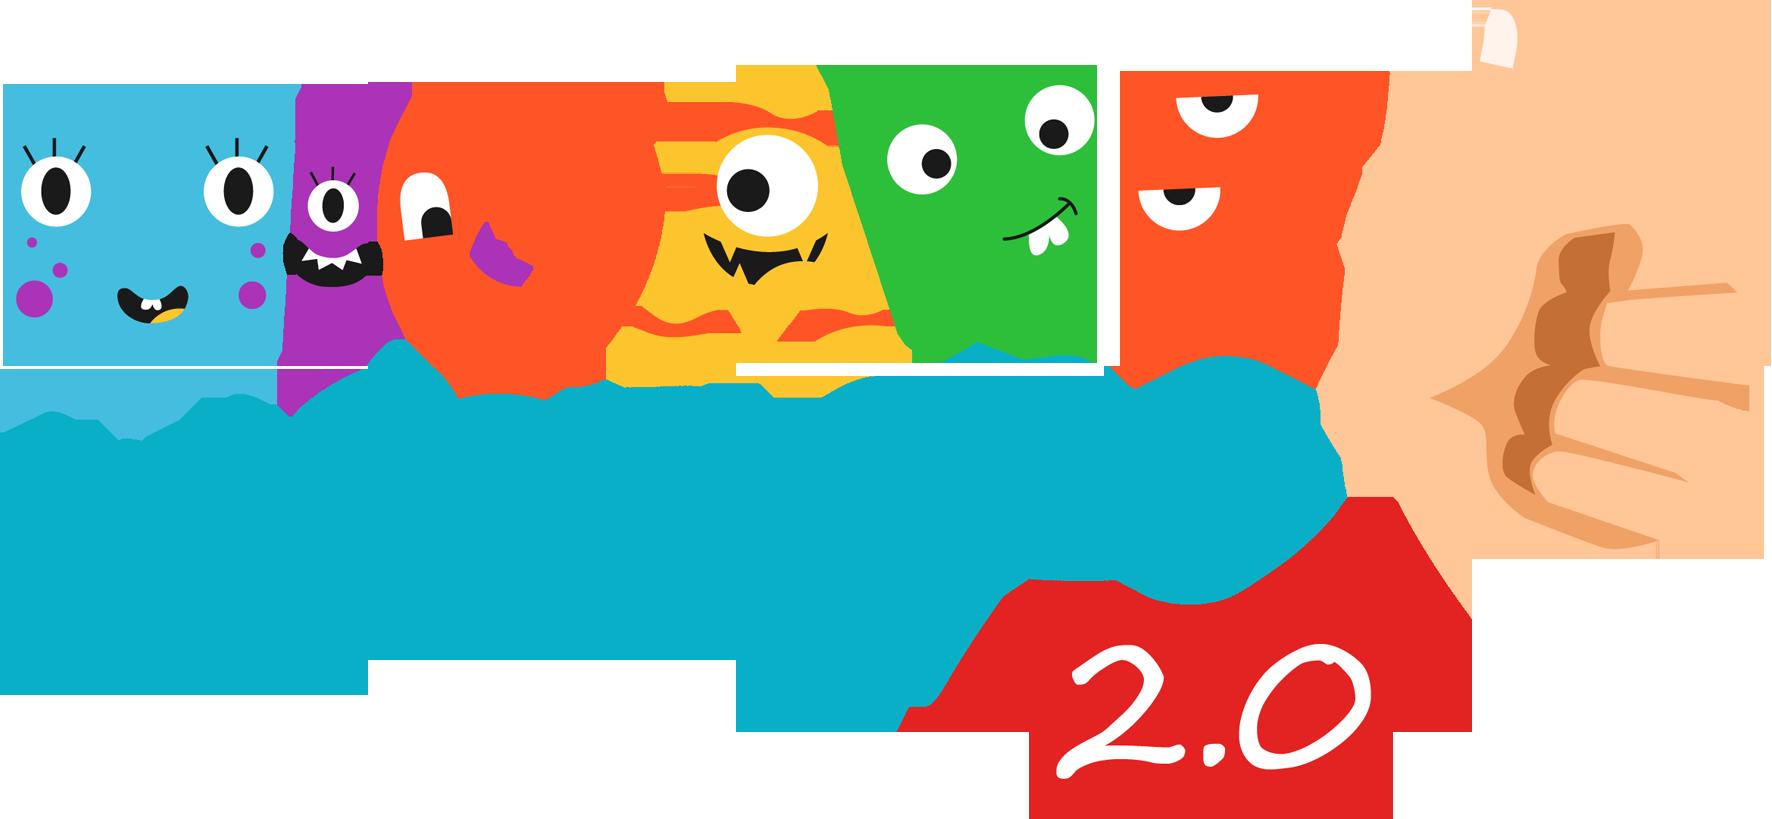 miganewiersze.pl